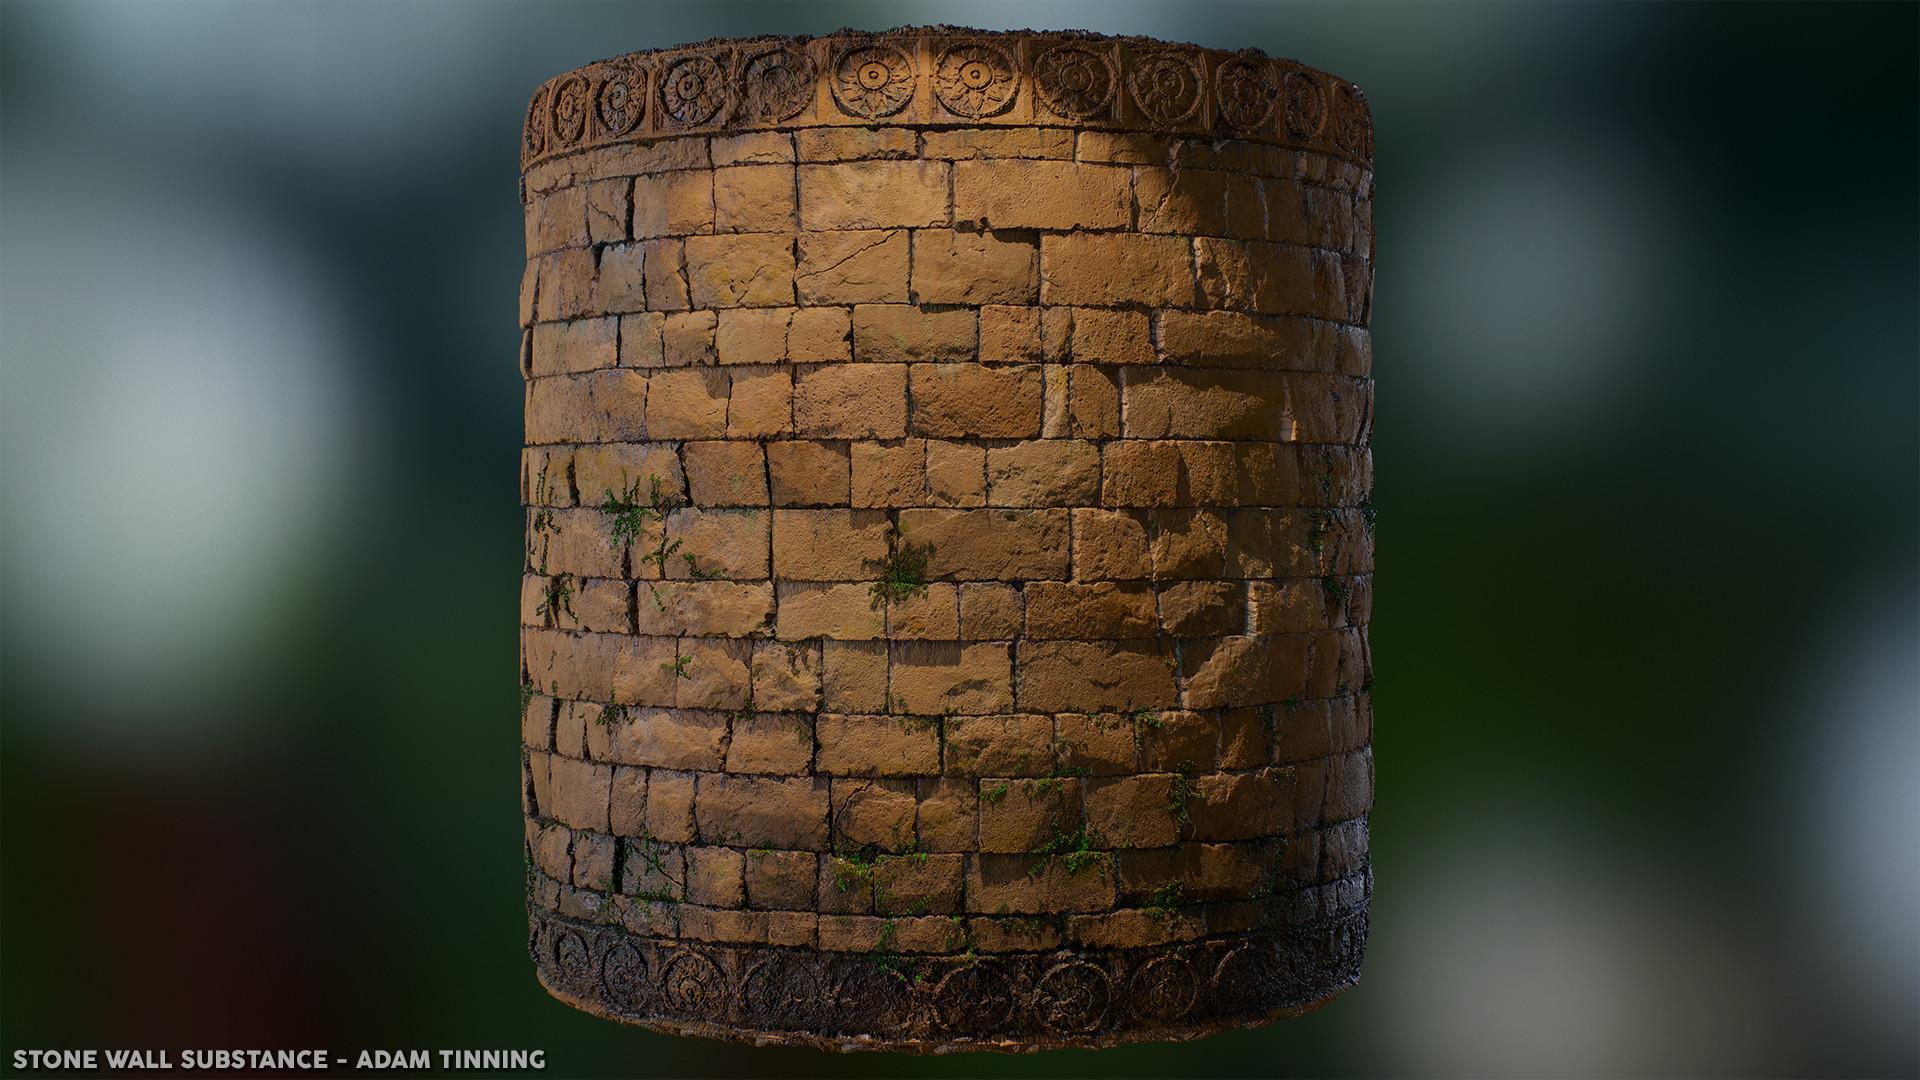 Adam tinning stonewall render 05